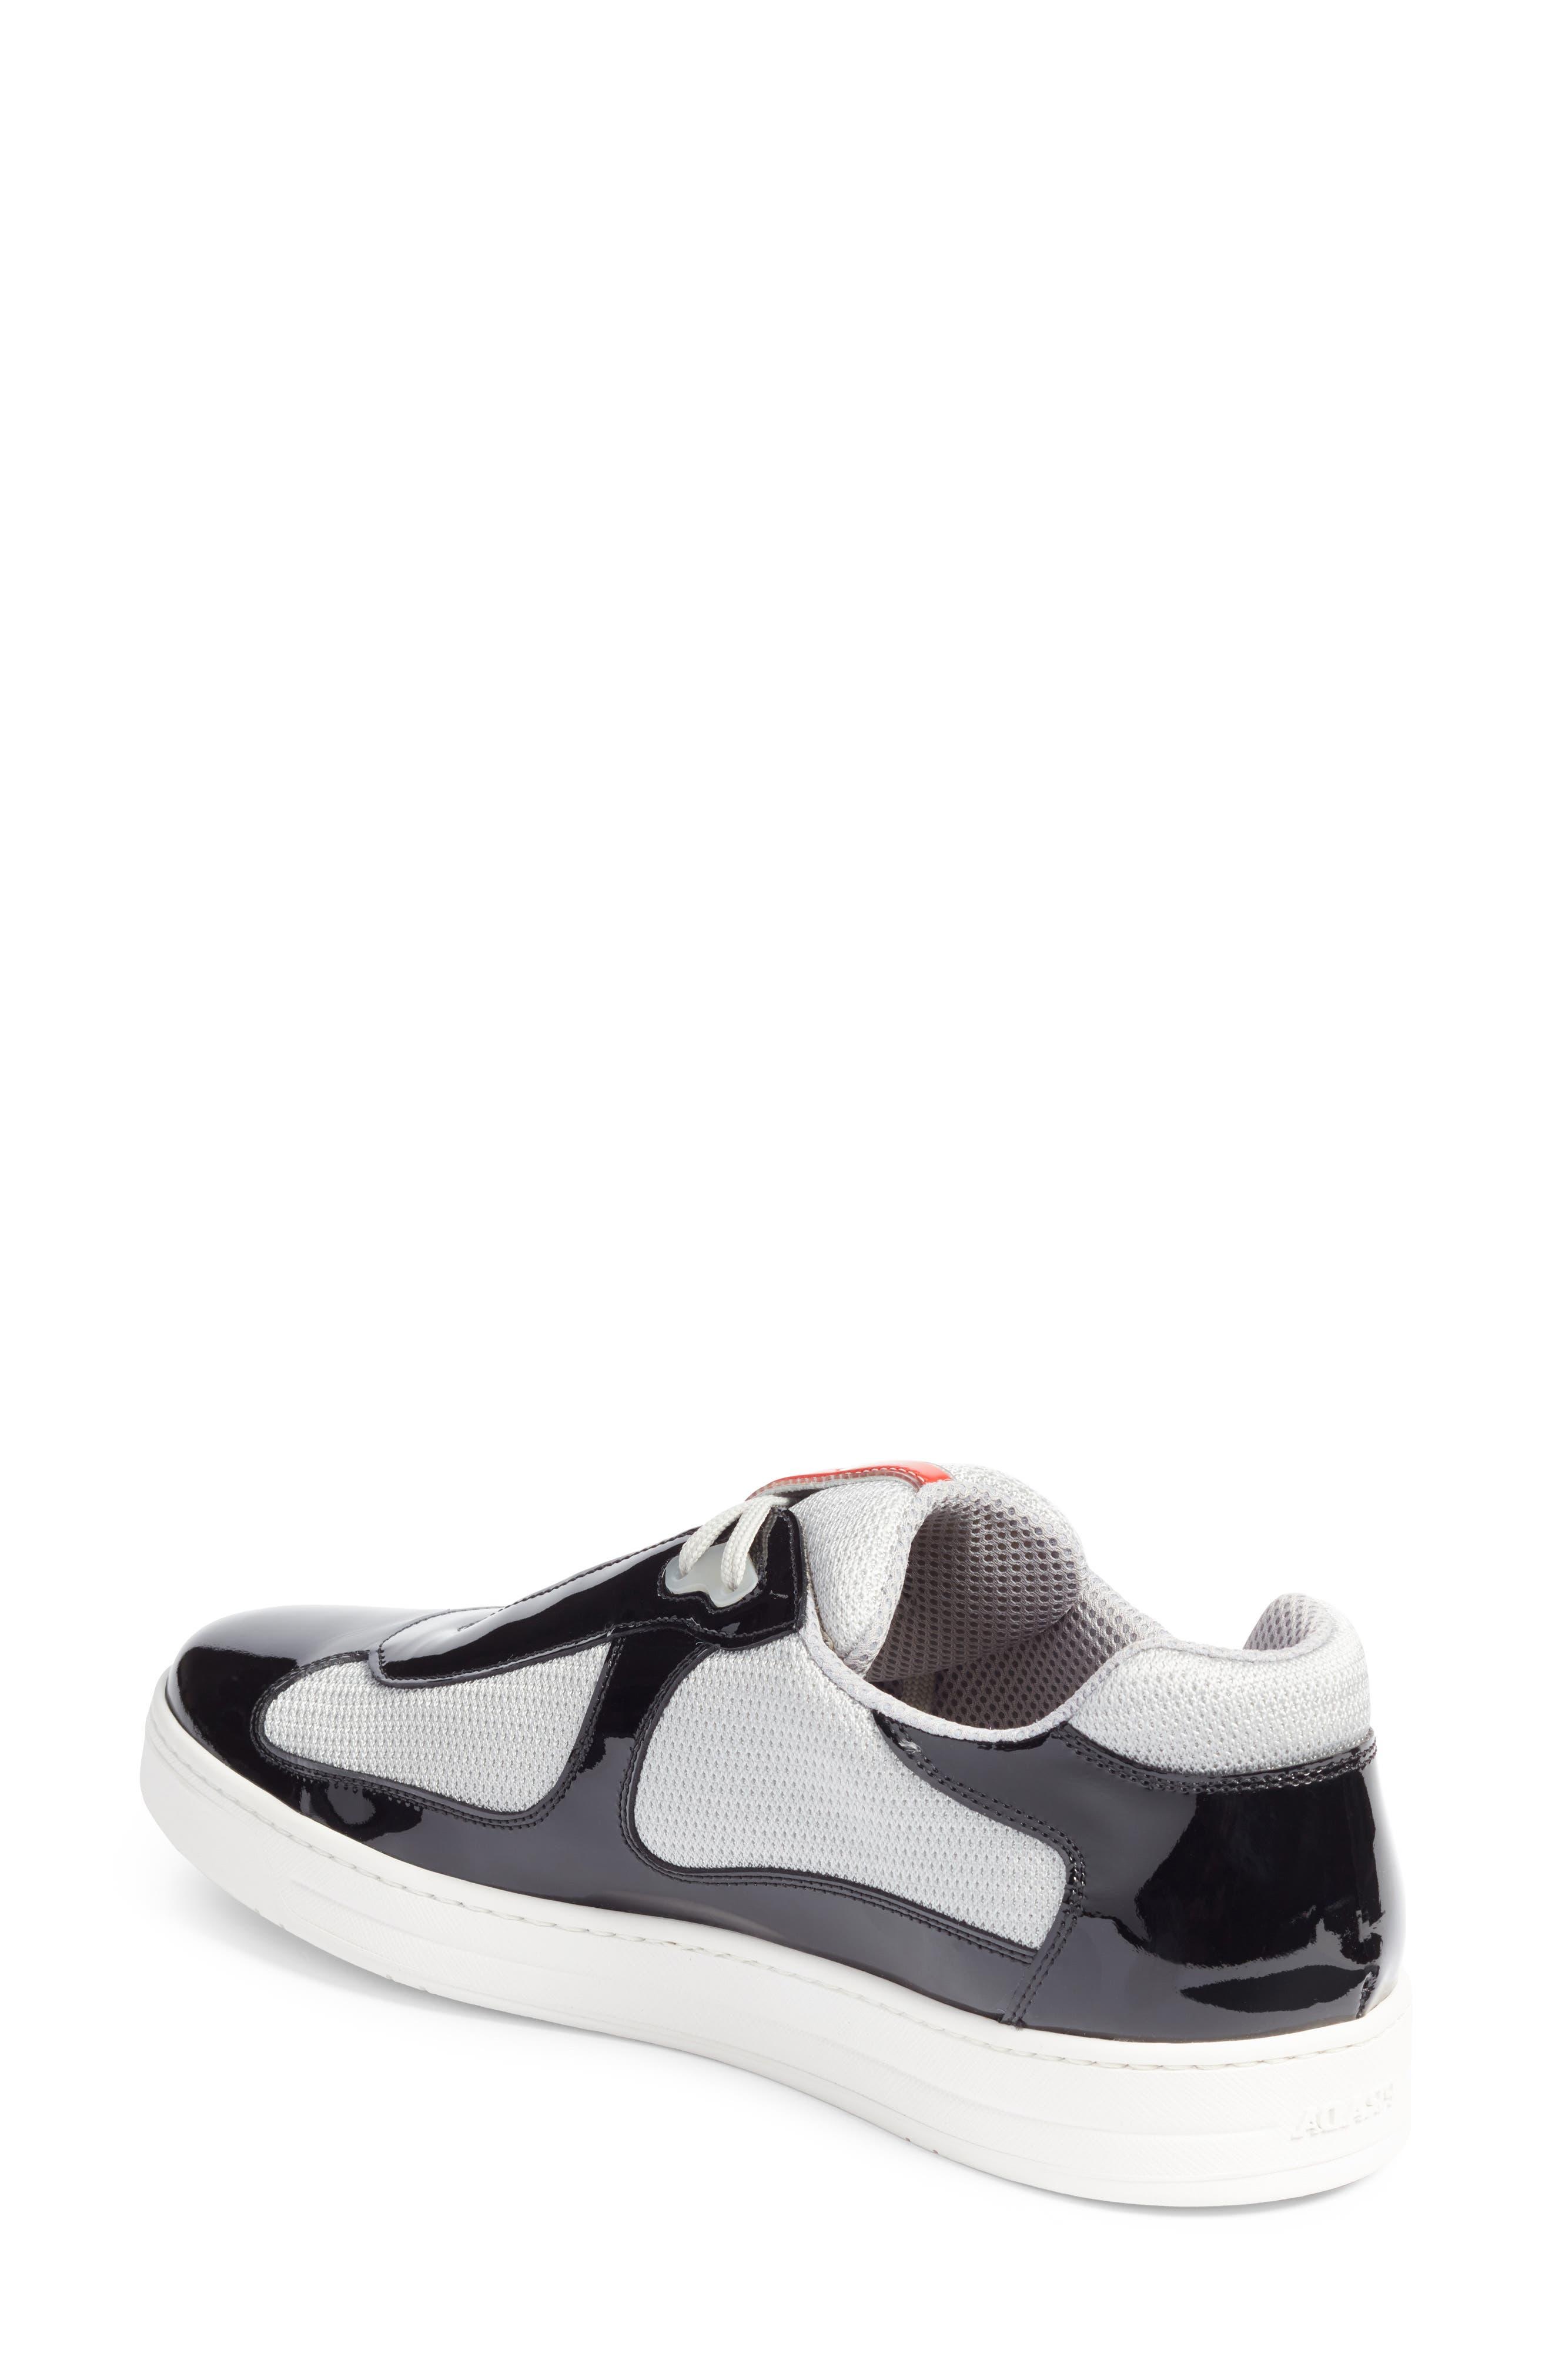 Linea Rossa New America's Cup Sneaker,                             Alternate thumbnail 2, color,                             Nero Argento